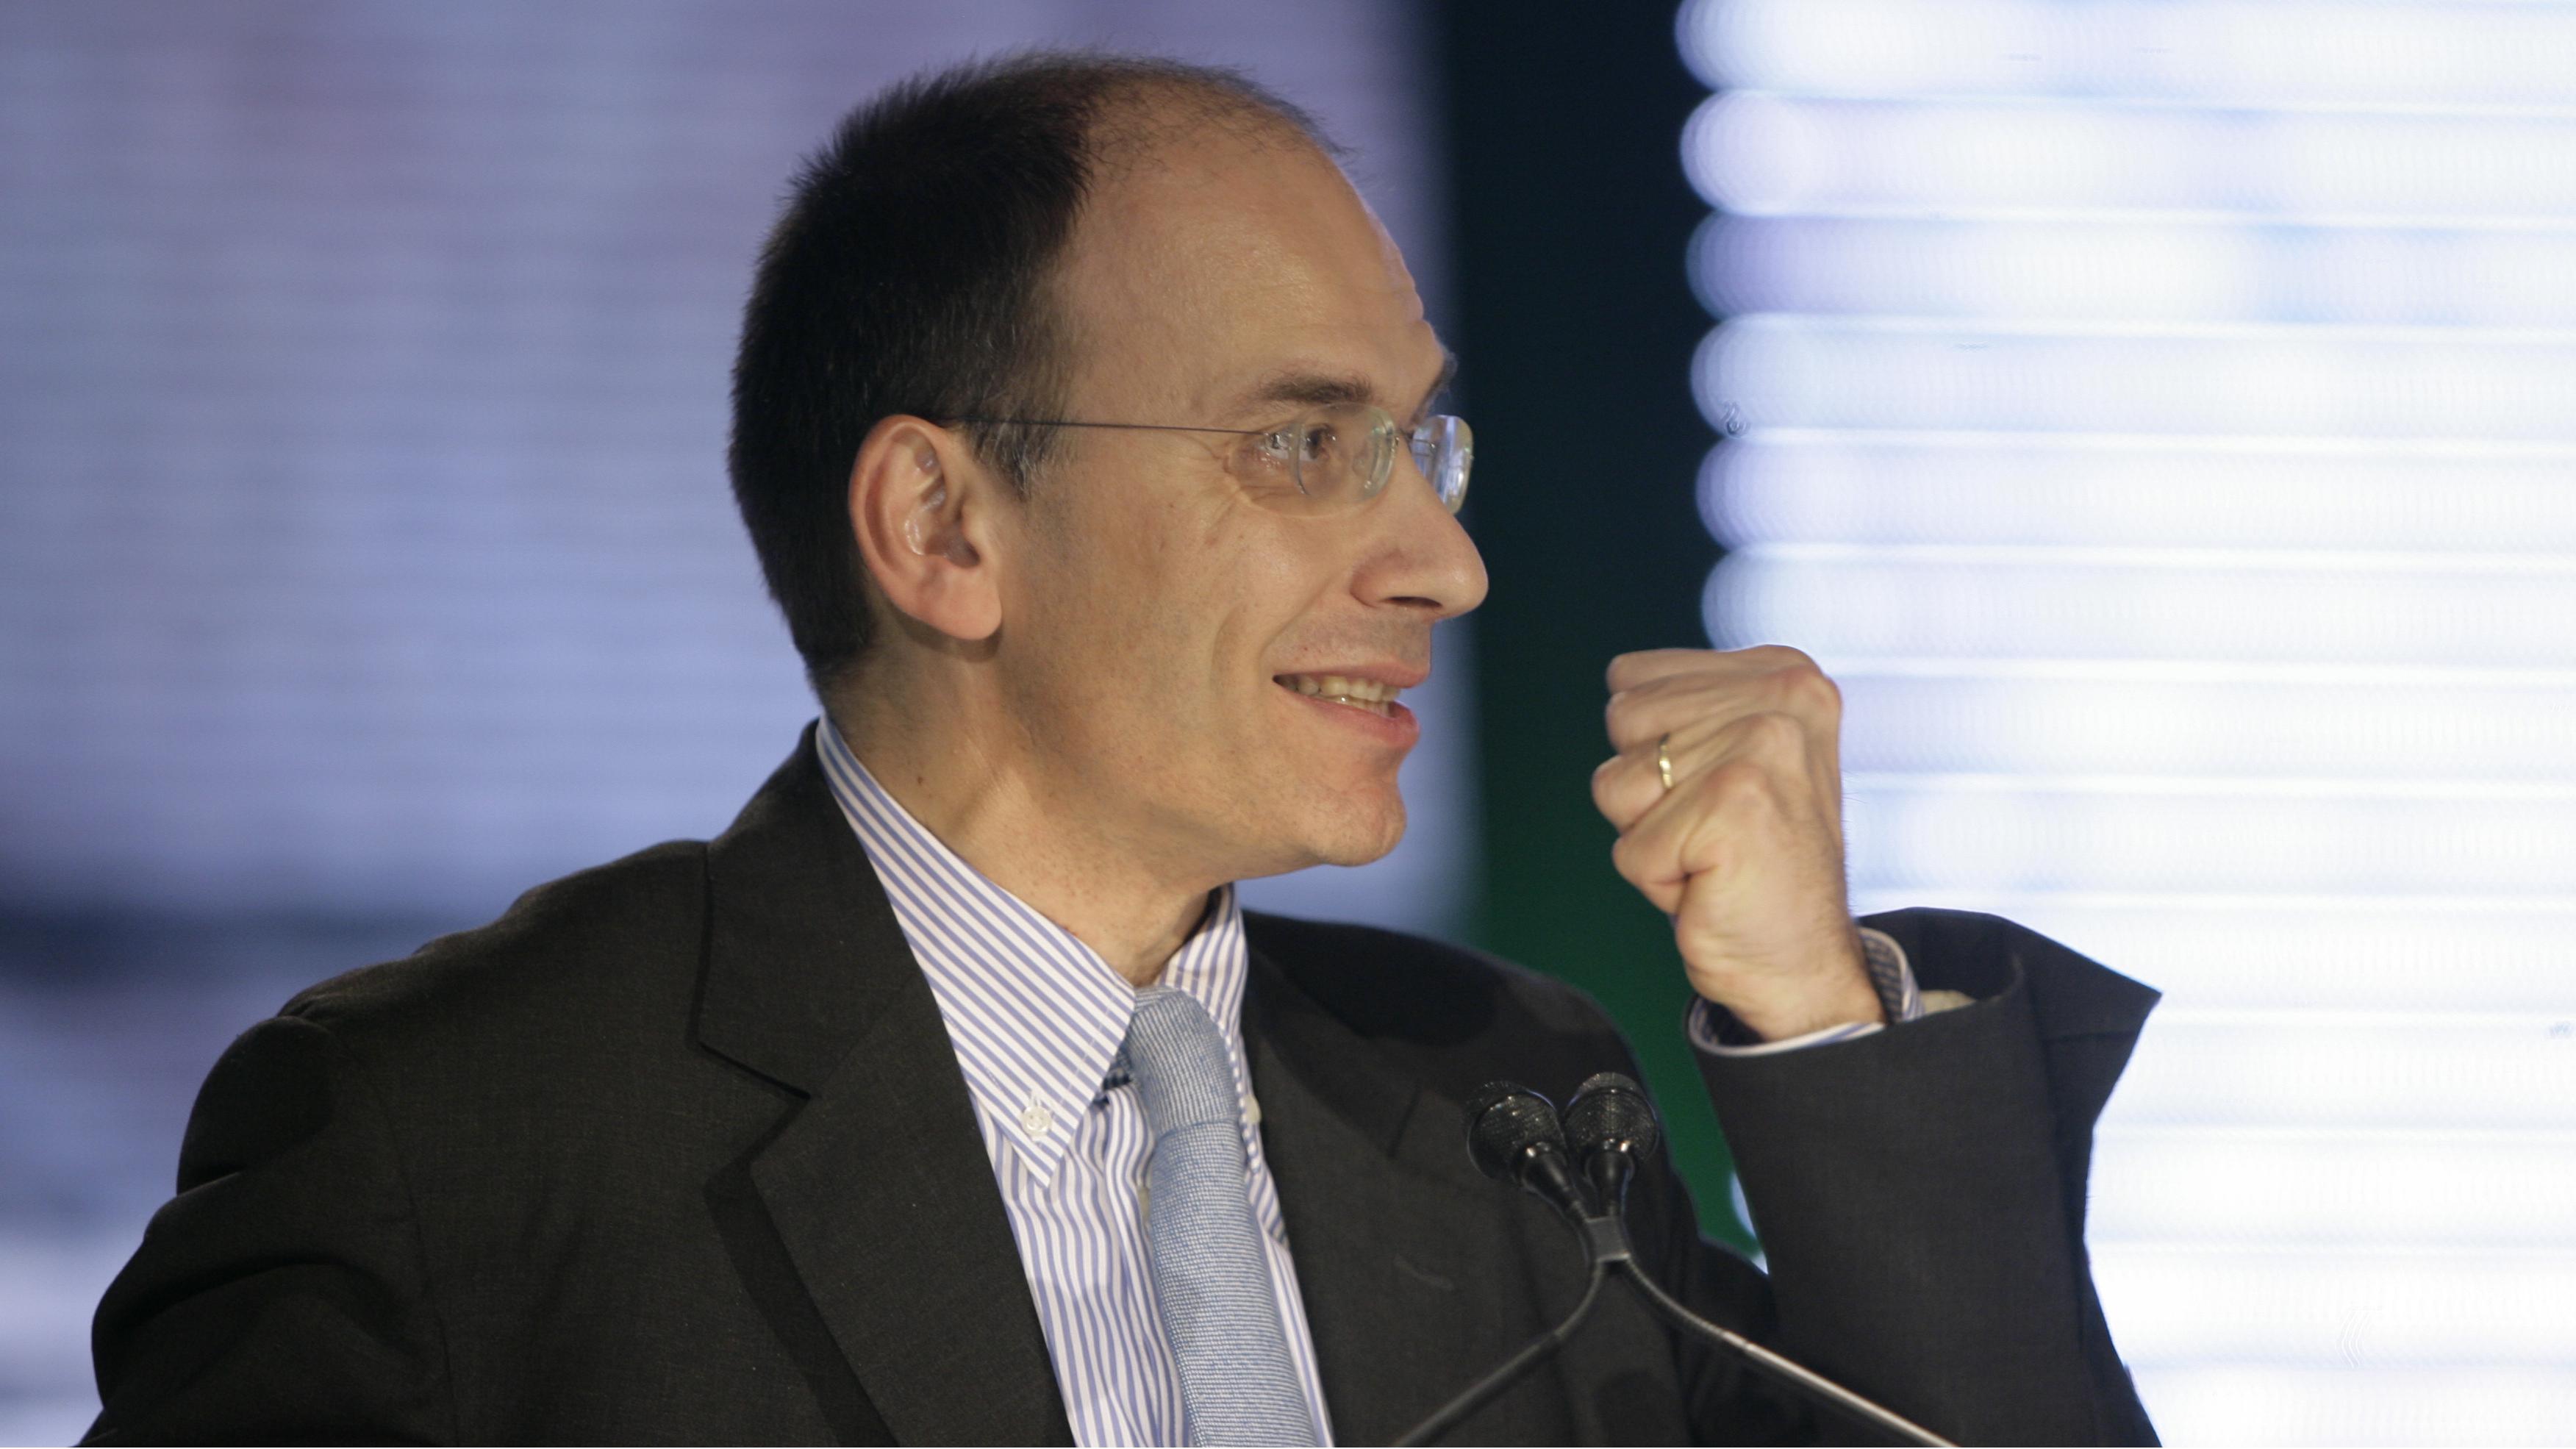 enrico letta italy prime minister